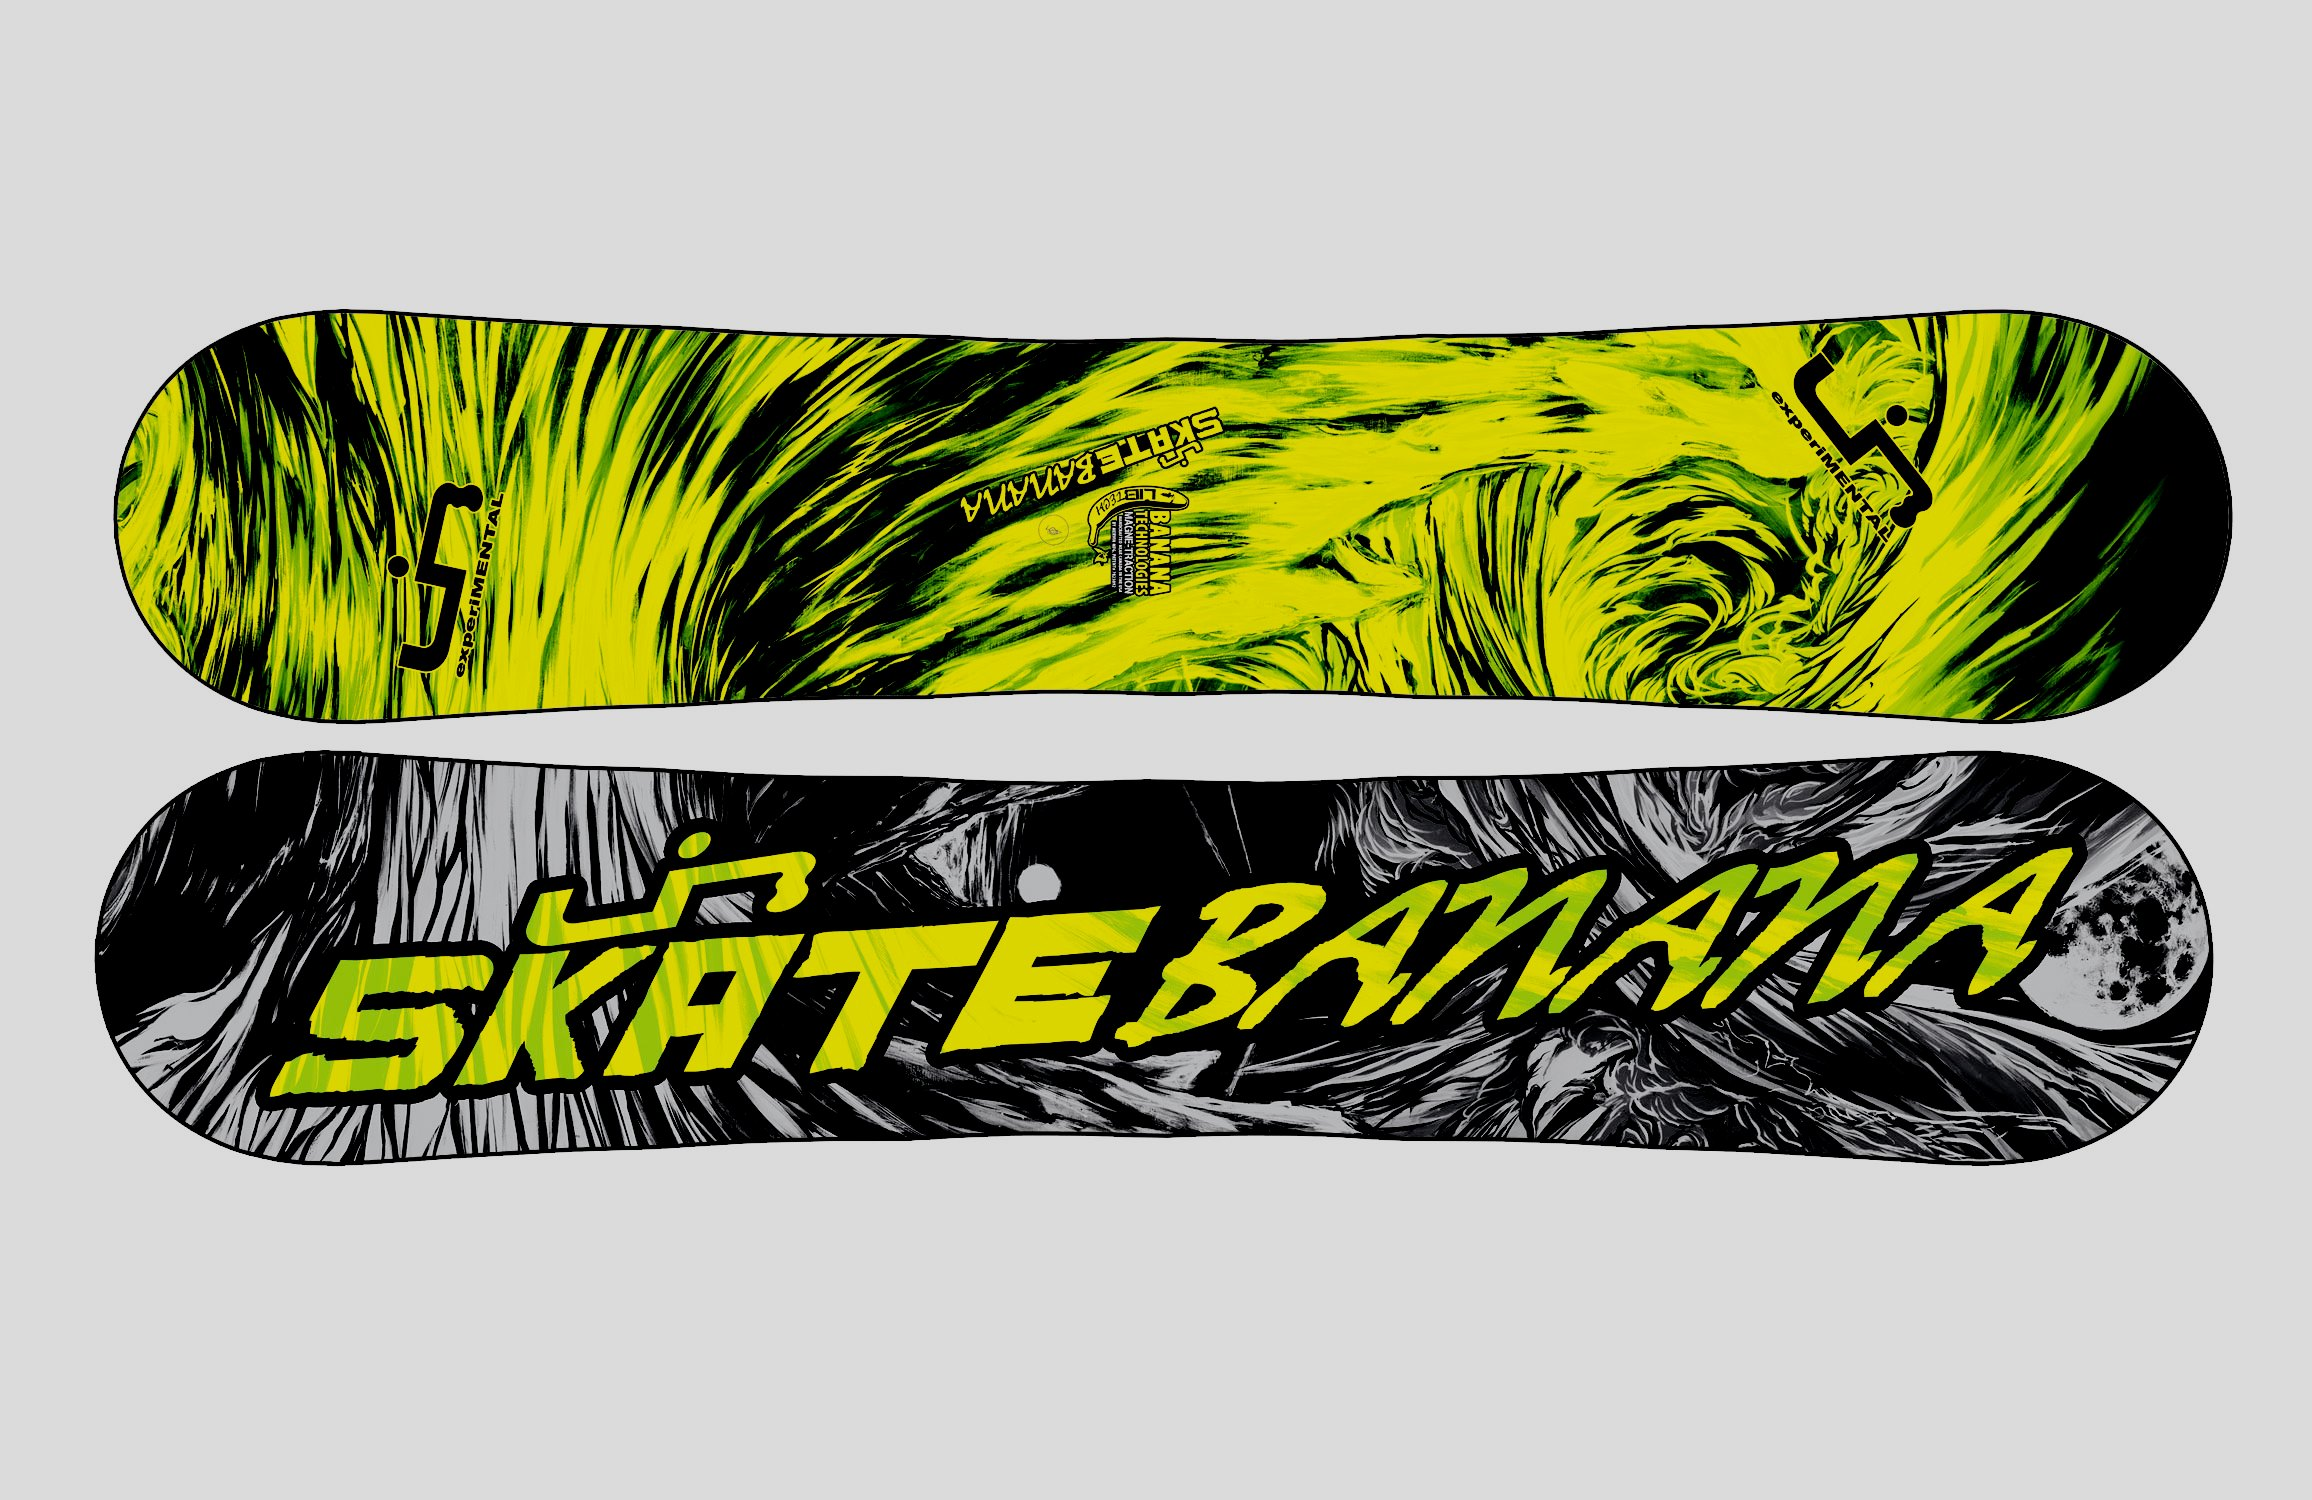 Lib Tech Skate Banana BTX